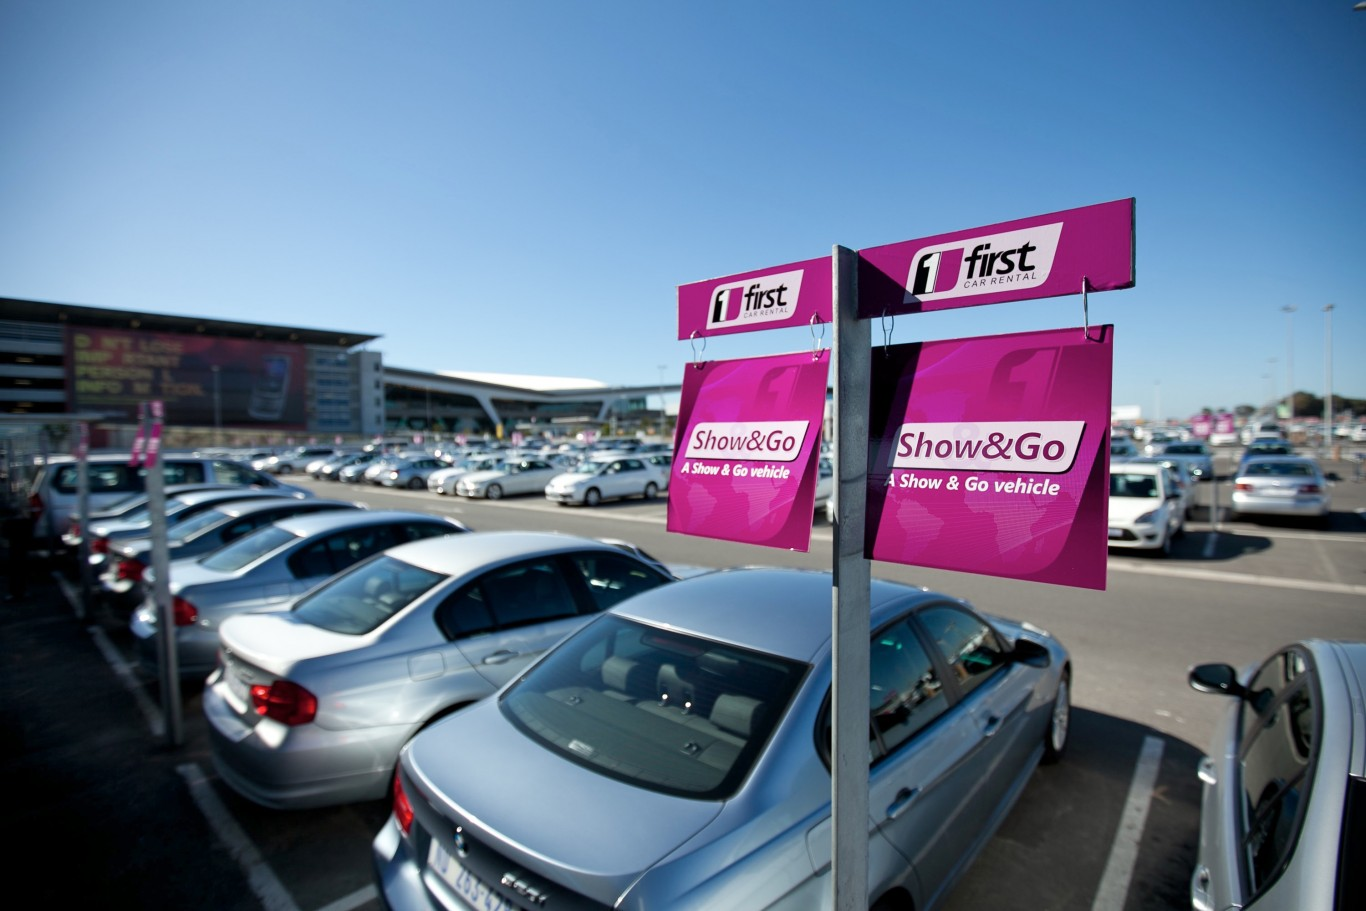 Top 10 car rental companies in South Africa